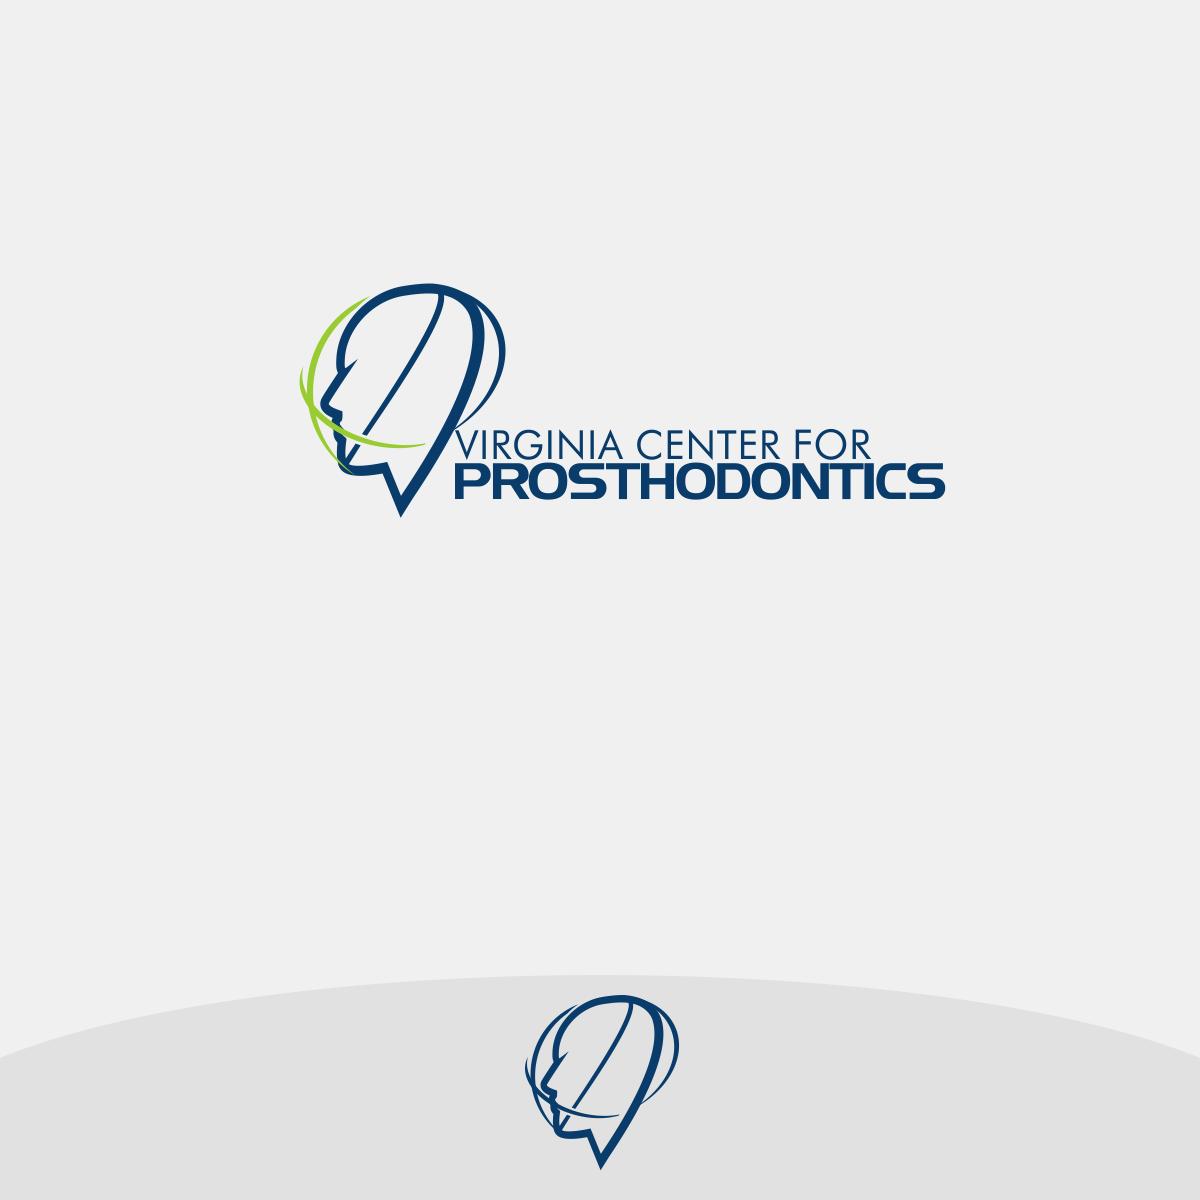 Logo Design by Private User - Entry No. 48 in the Logo Design Contest Imaginative Logo Design for Virginia Center for Prosthodontics.